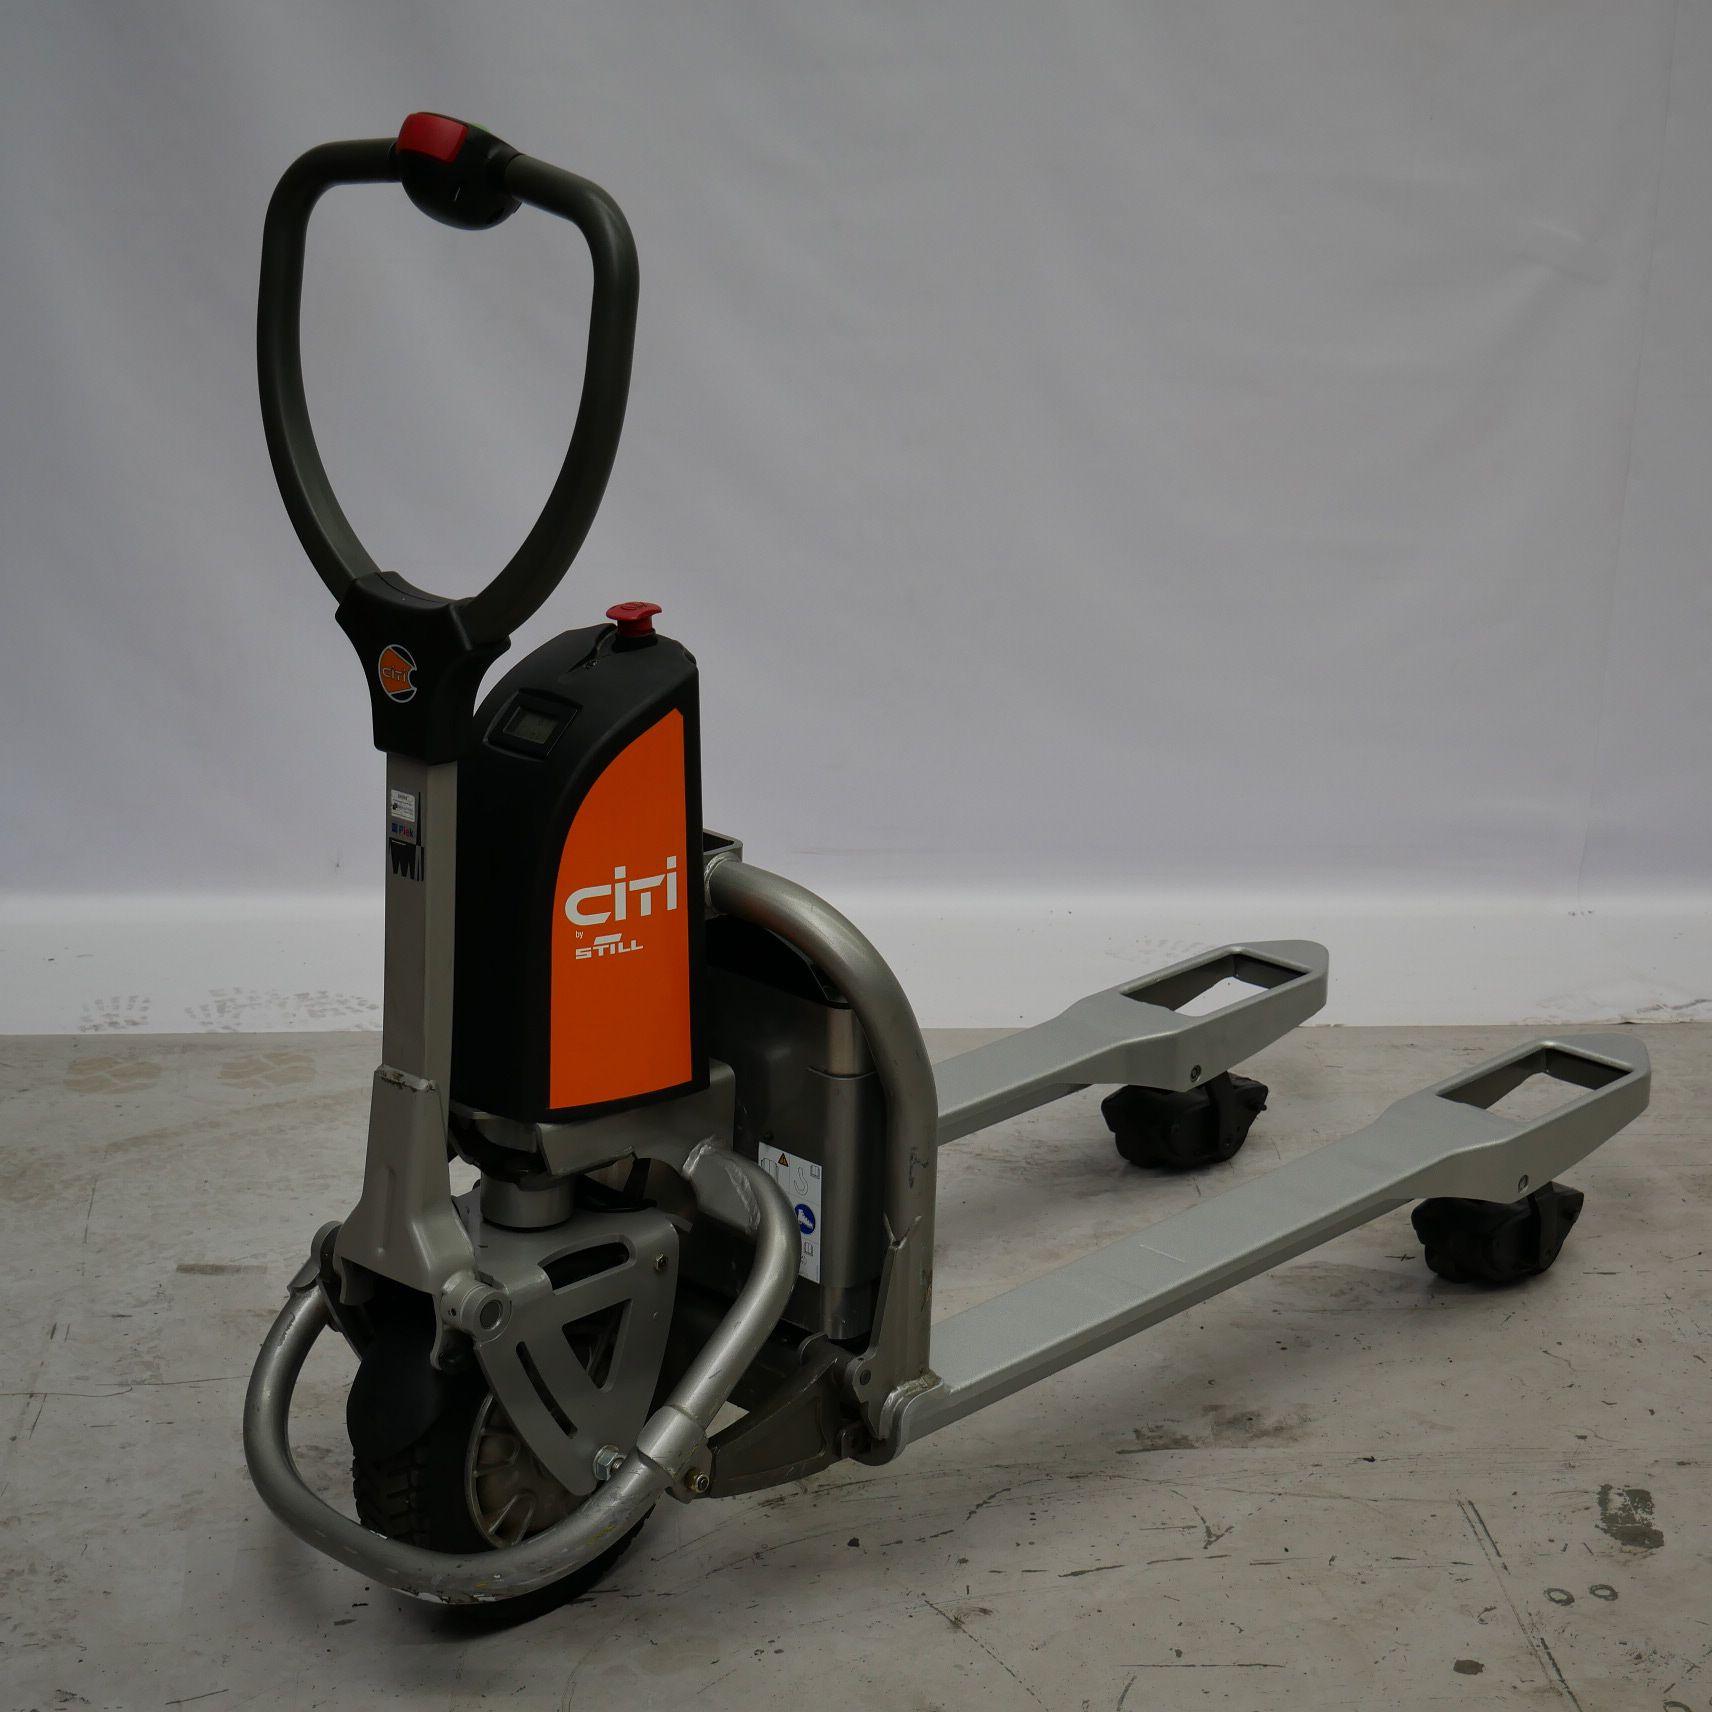 2017-still-citione-354288-equipment-cover-image